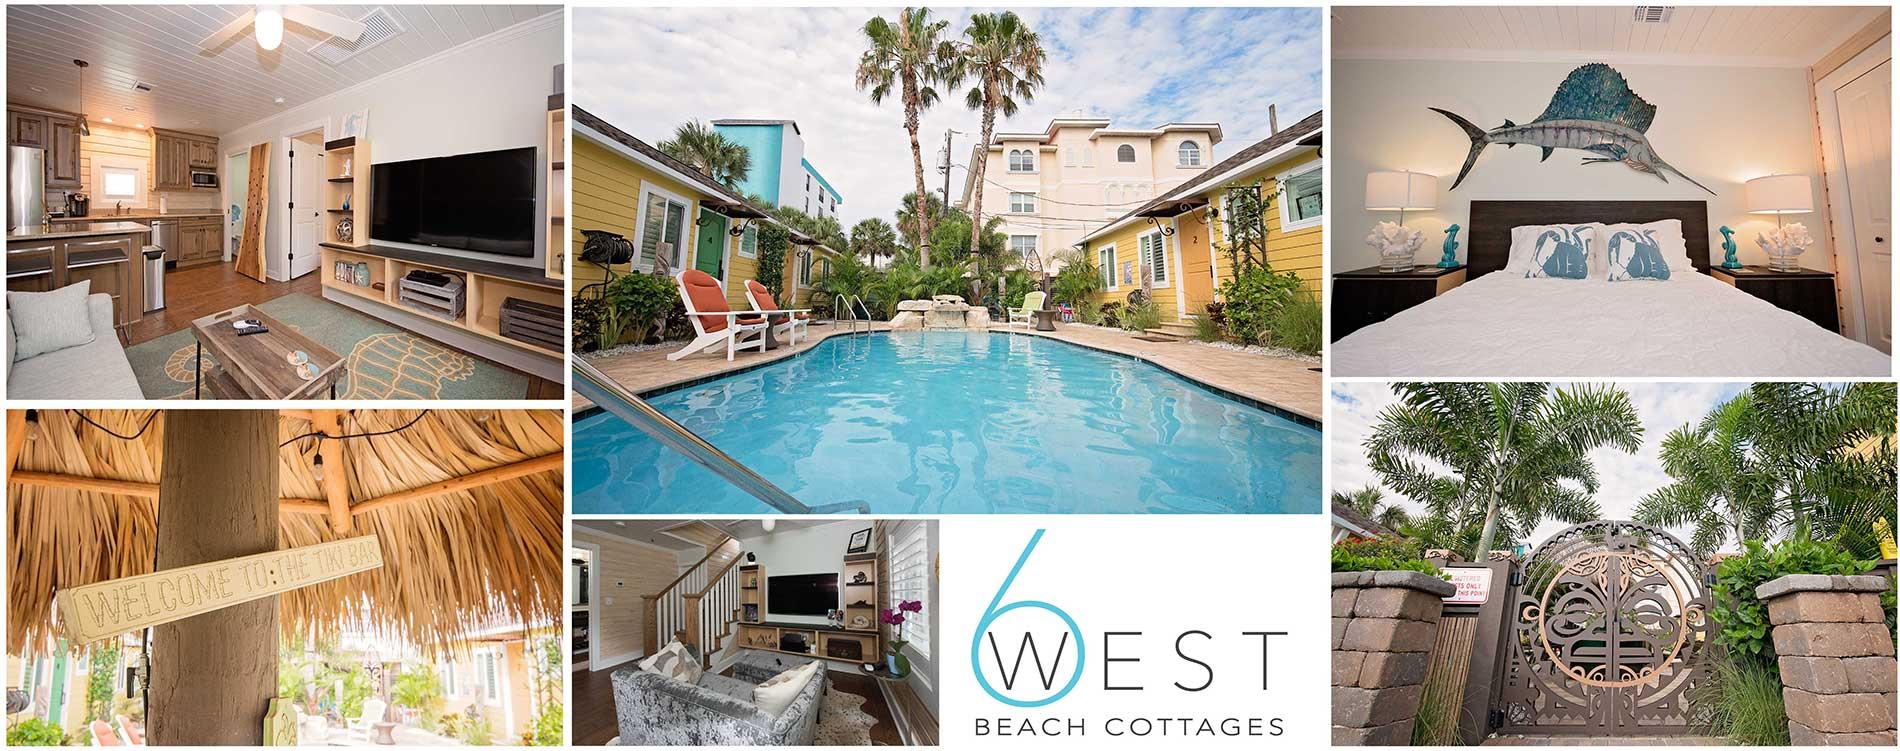 Sunset Inn & Cottages & 6West Beach Cottages